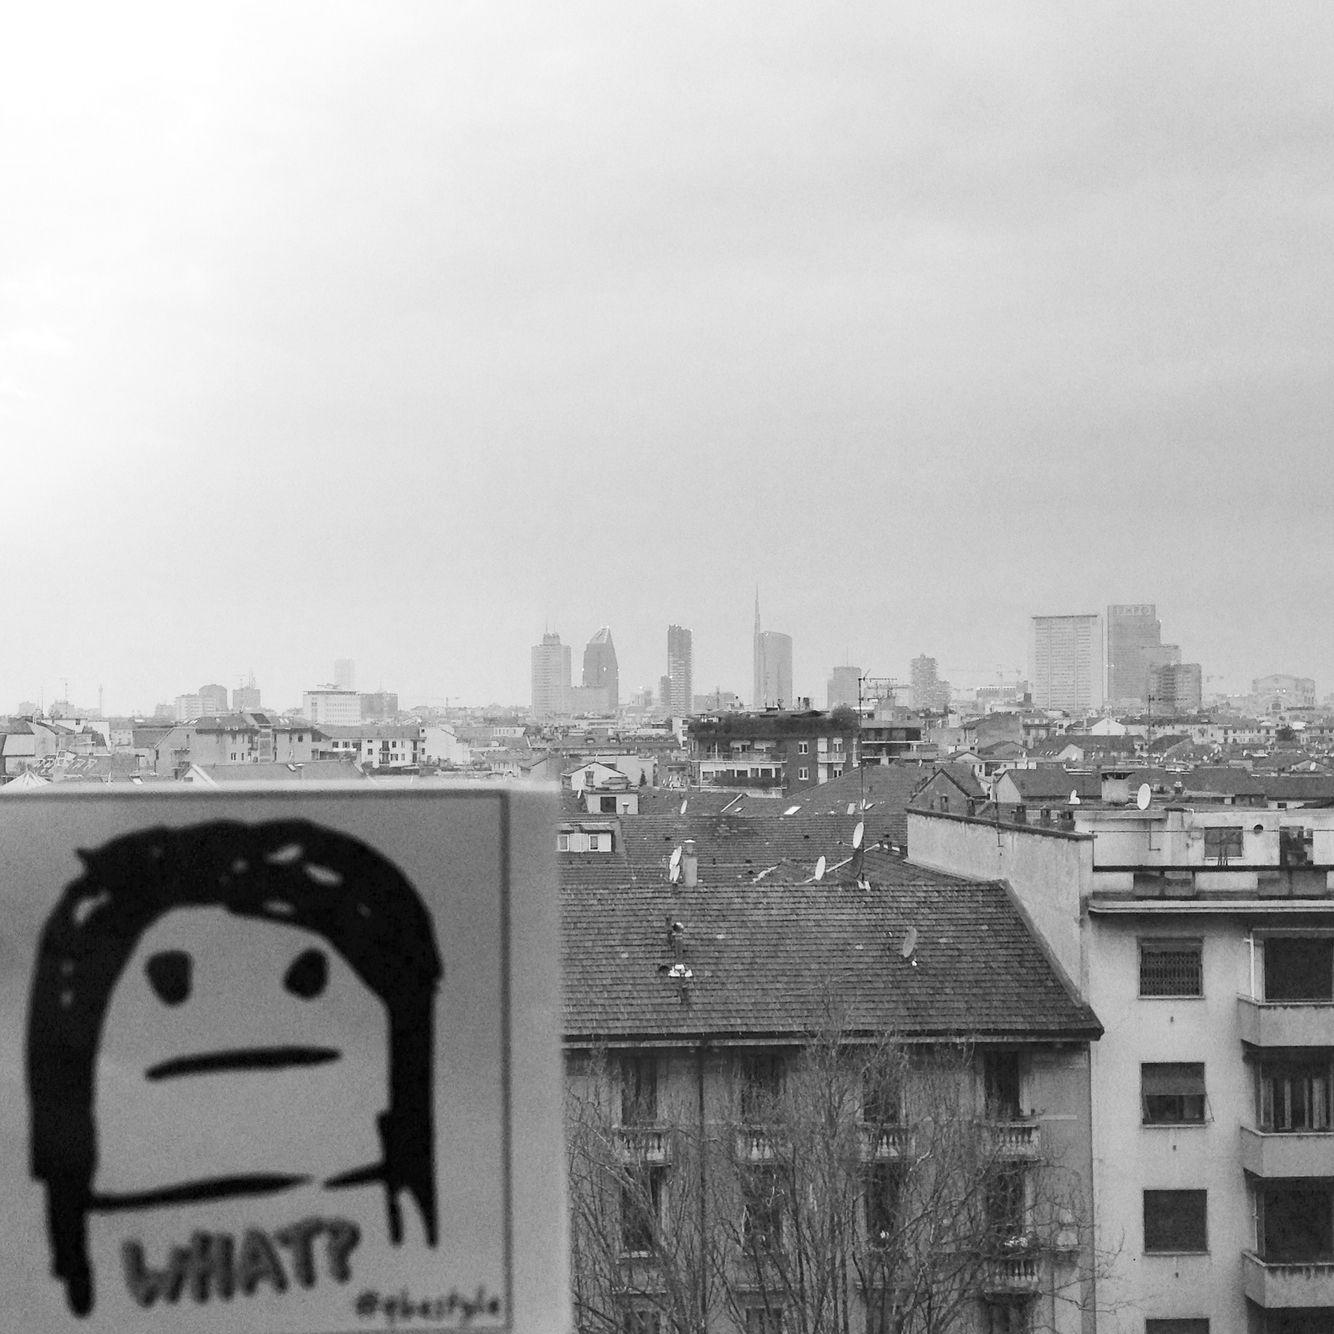 Milano, the skyline. View from piazza Leonardo da Vinci.   #qbestyle #tshirts #tee #qbestyler #wear #style #stylish #graffiti #italy #travel #streetart #italianstyle #outfit #fashion #stickers #milano #milan #ilovemilano #skyline #art #architecture #italiandesign #design   qbestyle.com